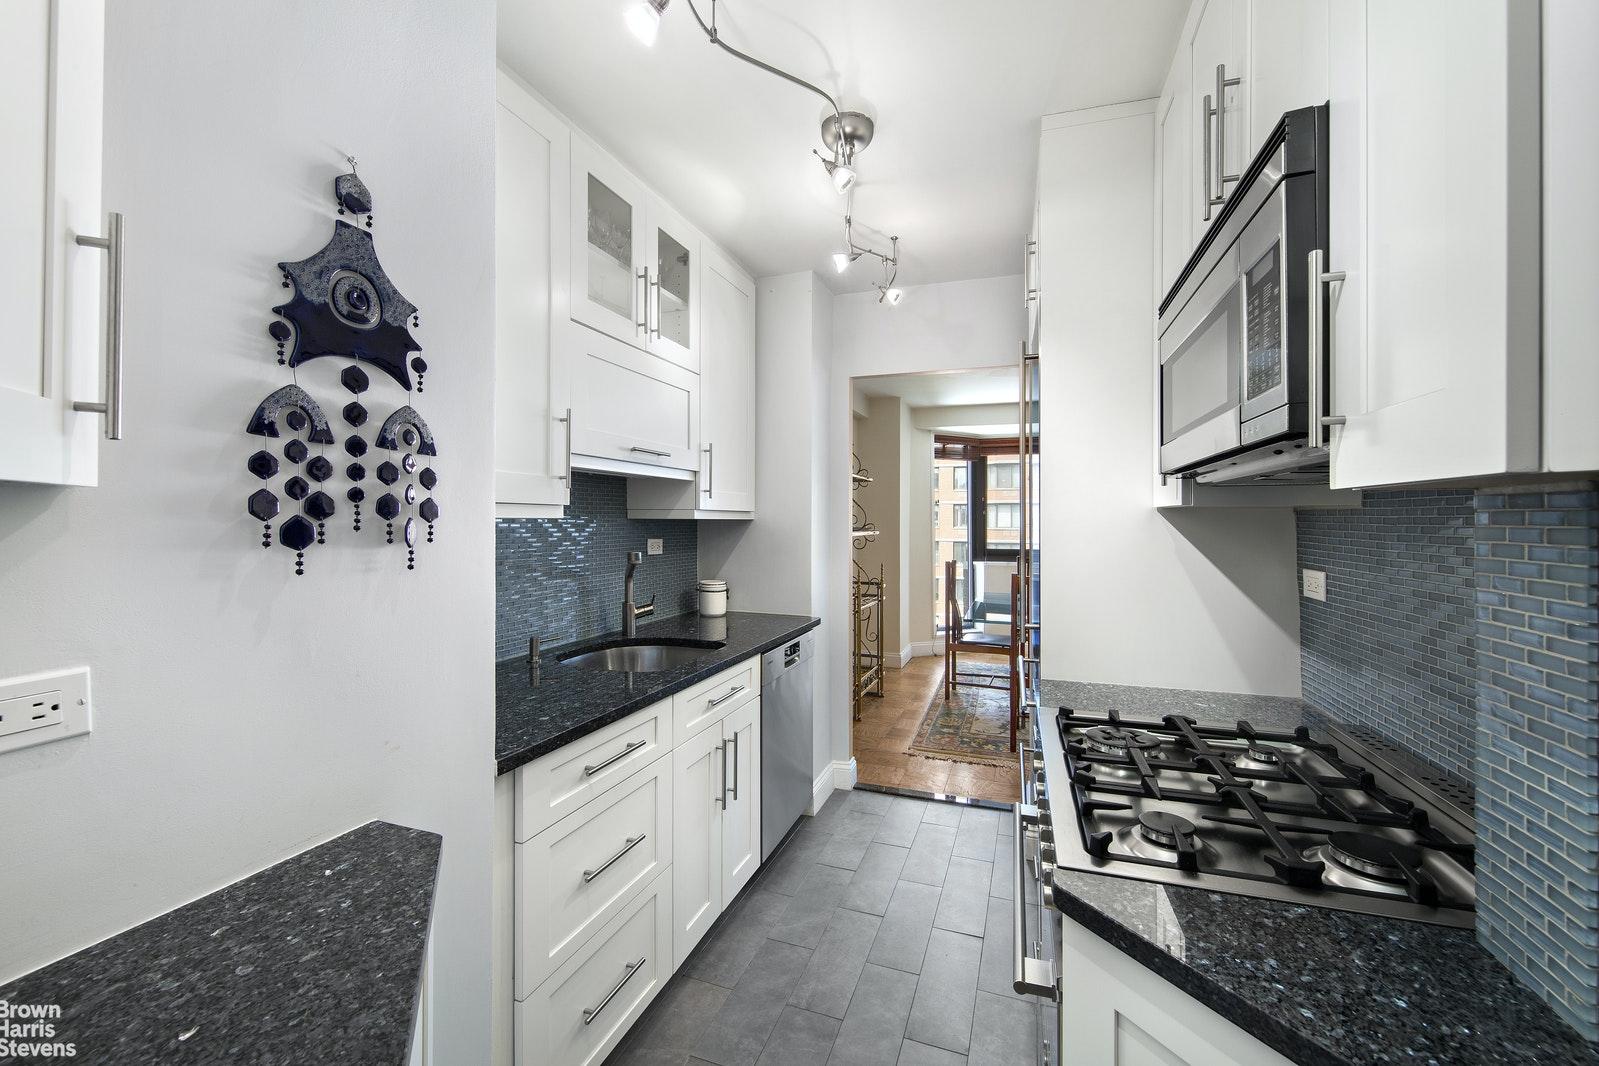 1725 YORK AVENUE 12H, Upper East Side, $875,000, Web #: 20198862